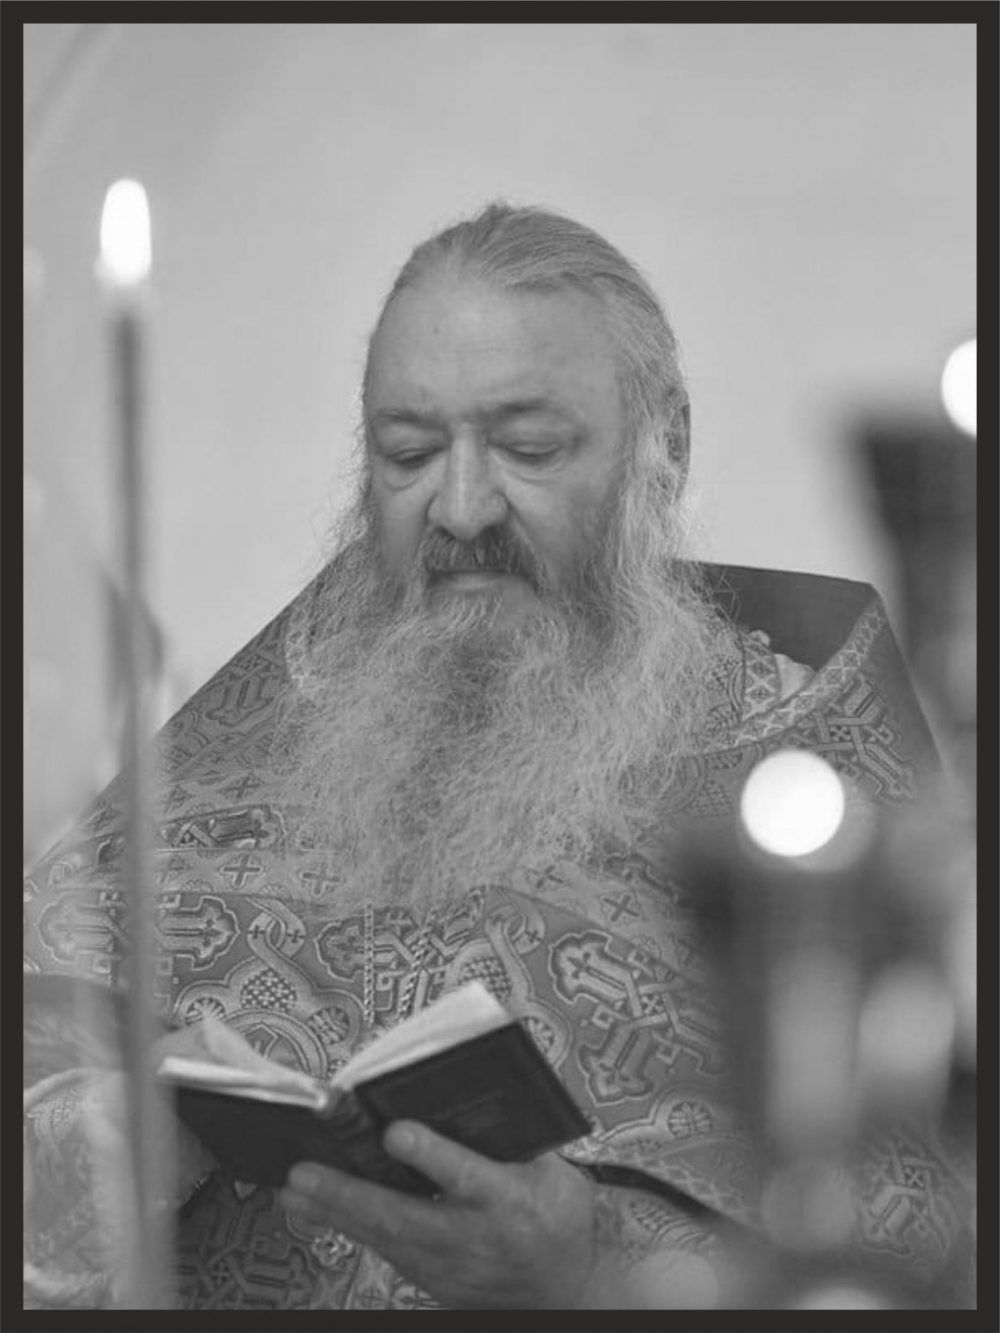 Митрополит Савва выразил соболезнование в связи с кончиной протоиерея Димитрия Жданова